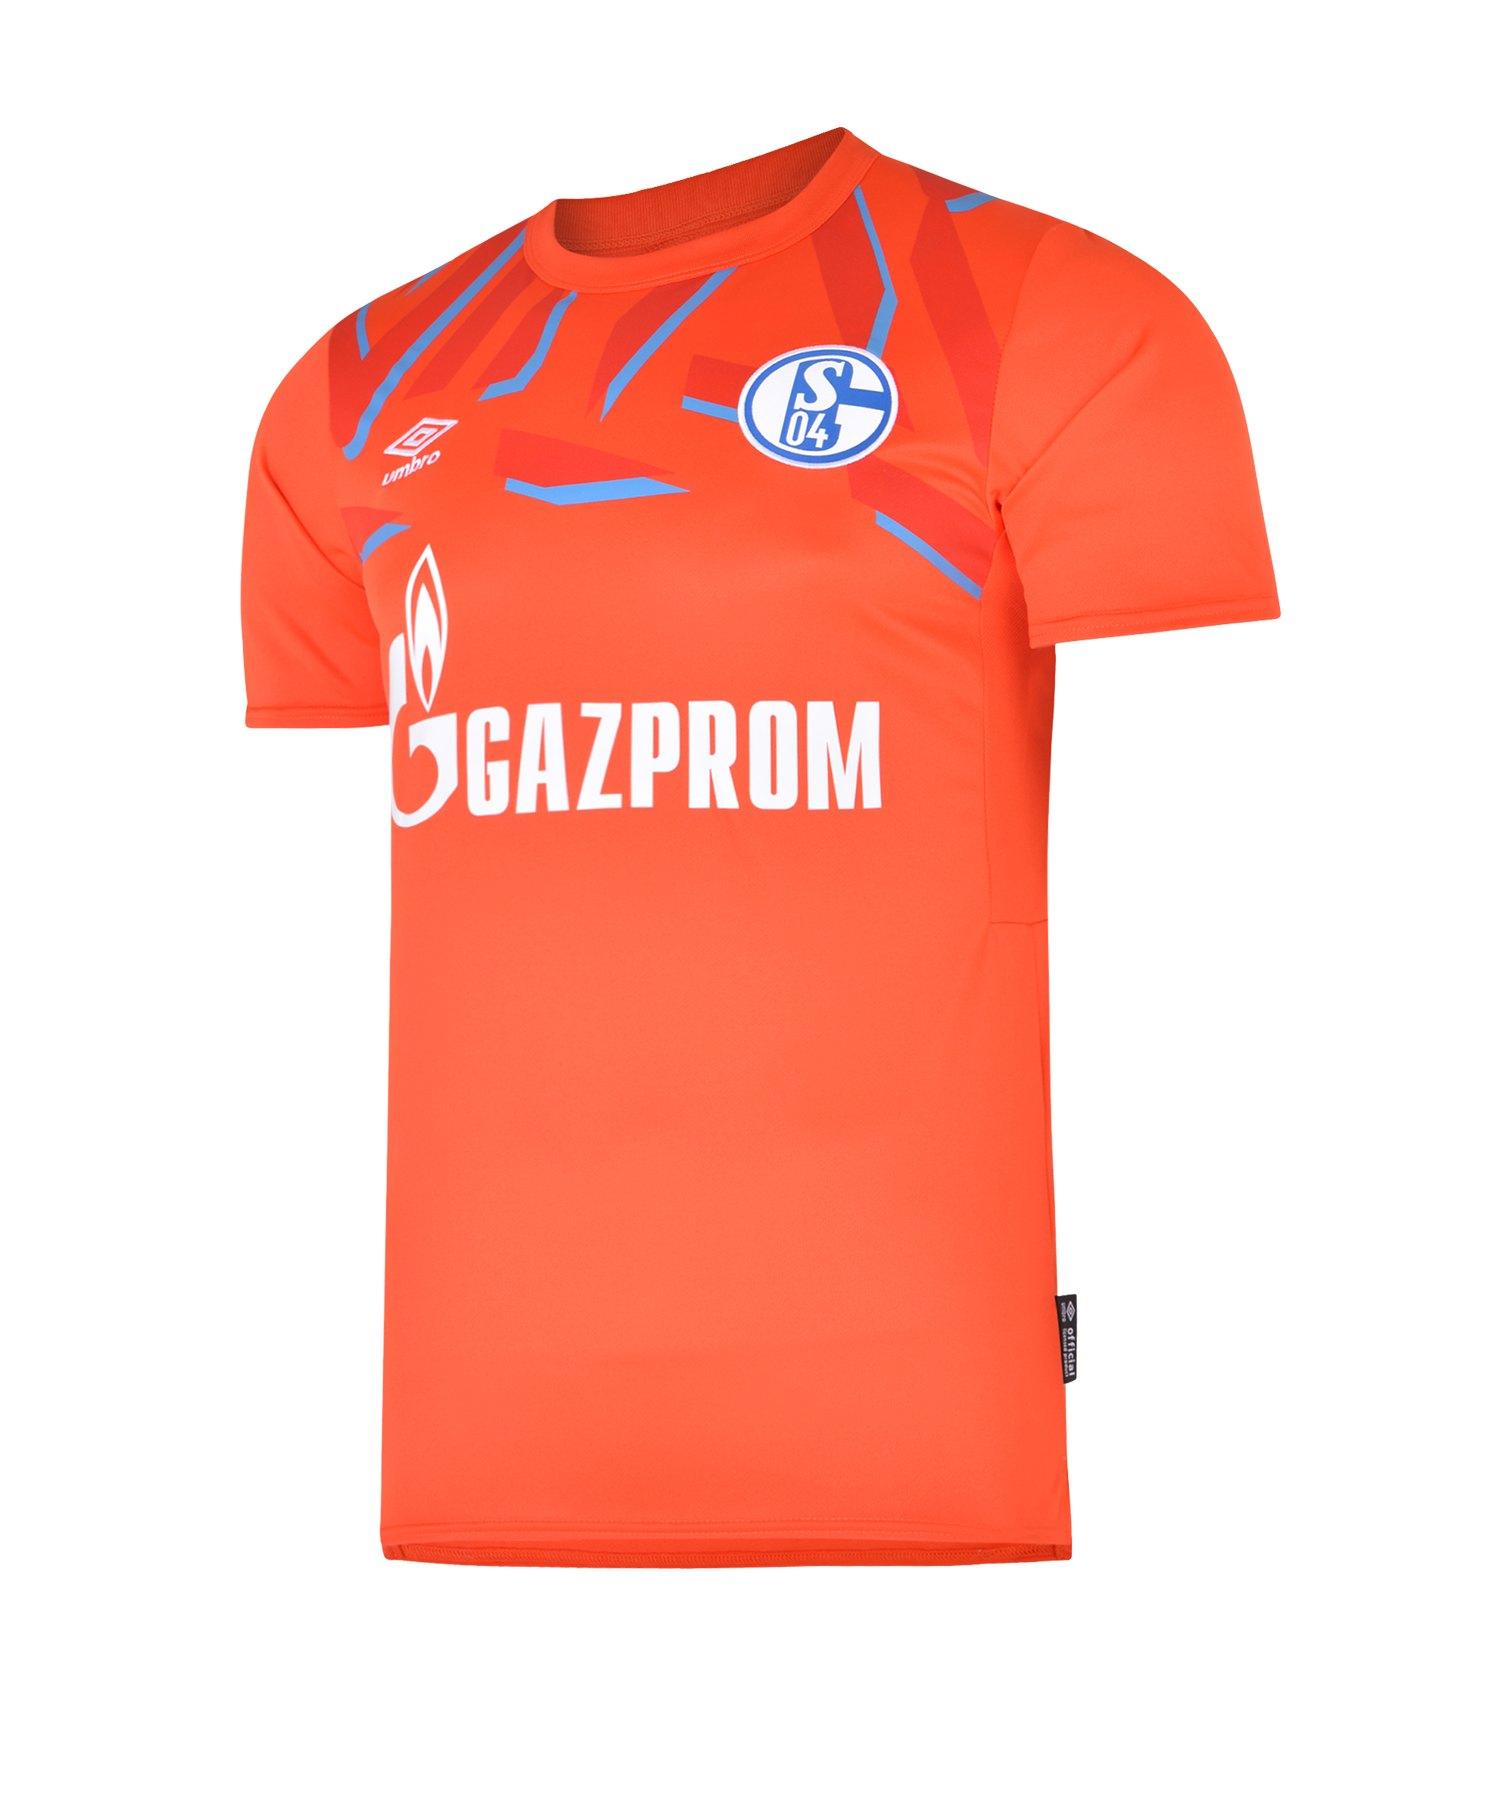 detailed look 8c092 5665a Umbro FC Schalke 04 Torwarttrikot Home Kids 2019/2020 Orange